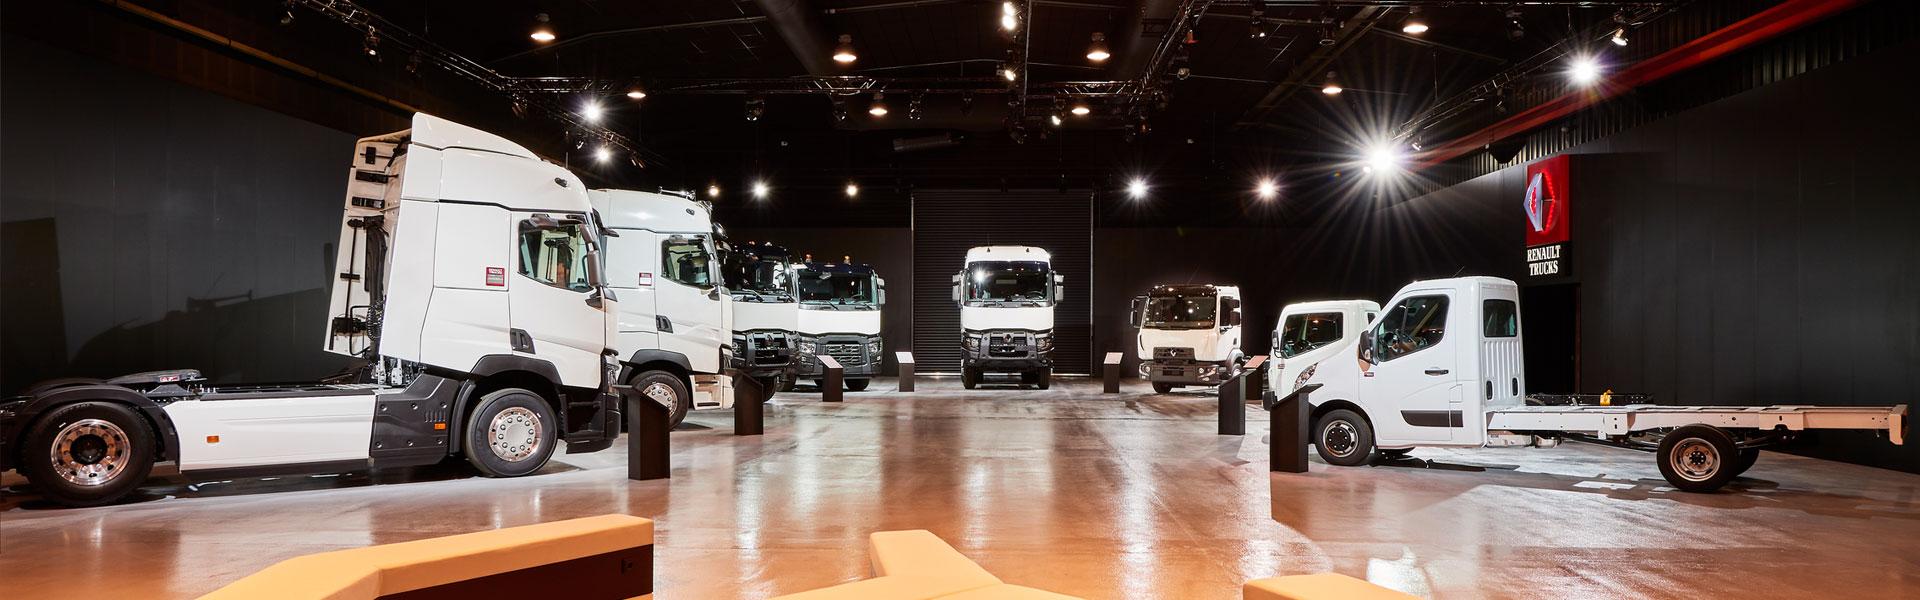 renault-trucks-motor-tarrega-rent-alquiler-lloguer-4